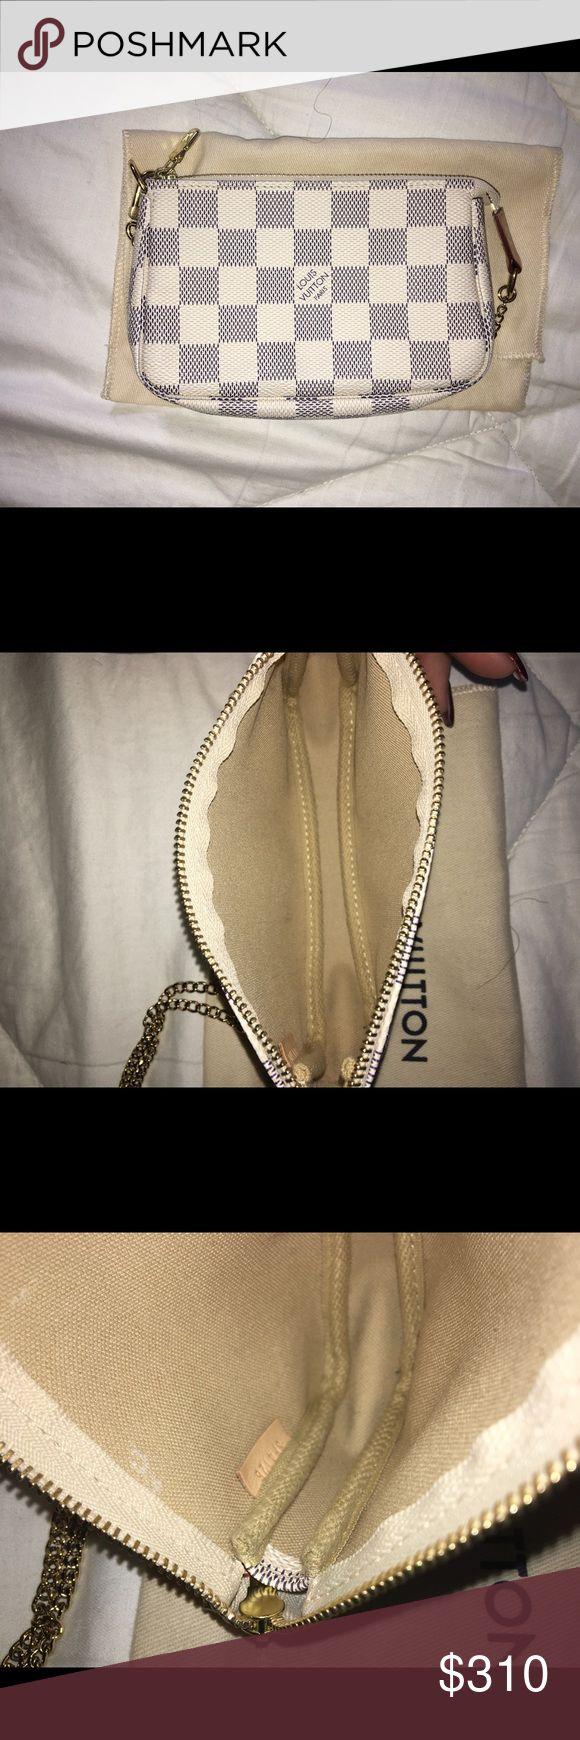 Louis Vuitton Mini Pochette Damier Azur 👜Mini Pochette Accessoires Damier Azur  Retails for $310  5.5x 3.5x 0.8 inches  (Lengthx Heightx Width)  Zipper closure Textile lining Golden metallic brass pieces including the chain Can be carried on the wrist Louis Vuitton Bags Clutches & Wristlets